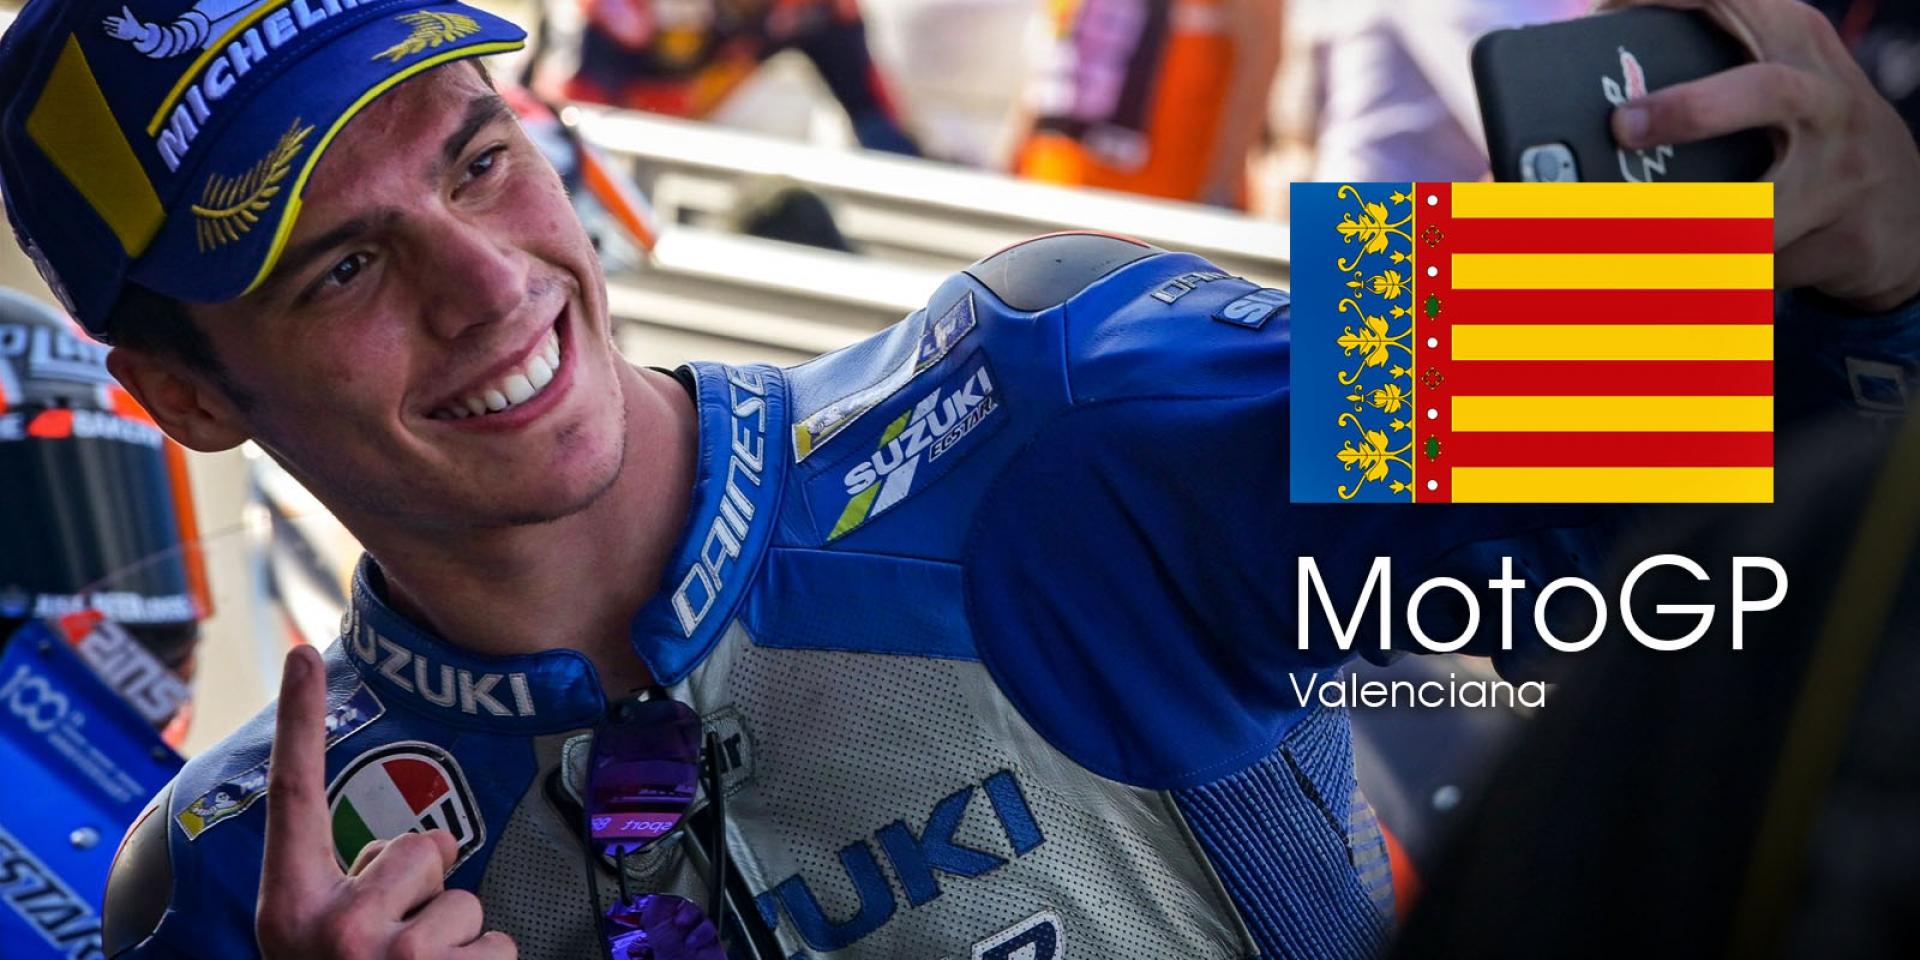 MotoGP 2020 瓦倫西亞站 轉播時間